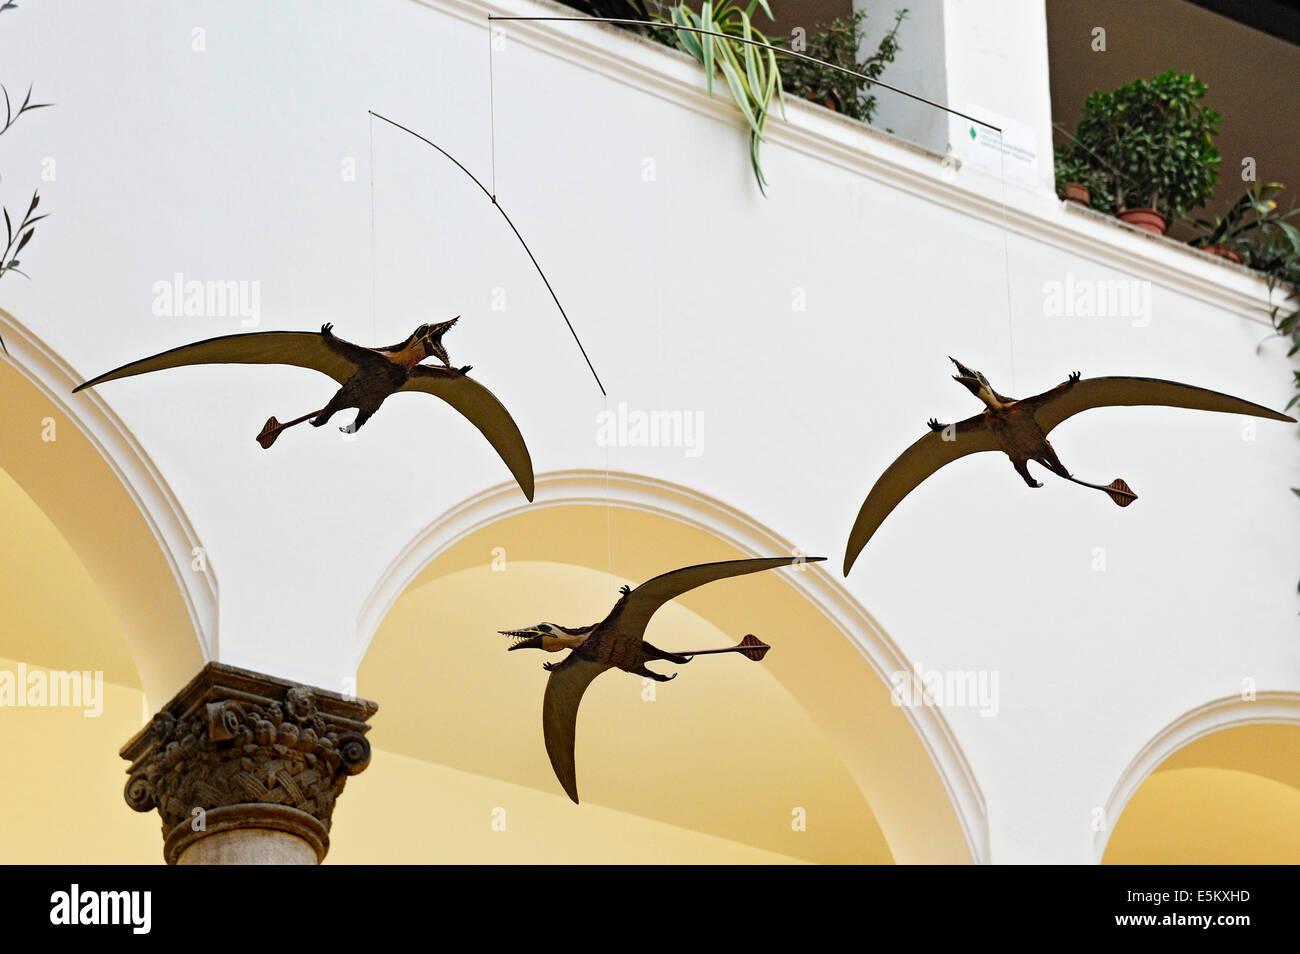 Pterosaurios, museo Paleontológico, Munich, Baviera, Alemania Imagen De Stock